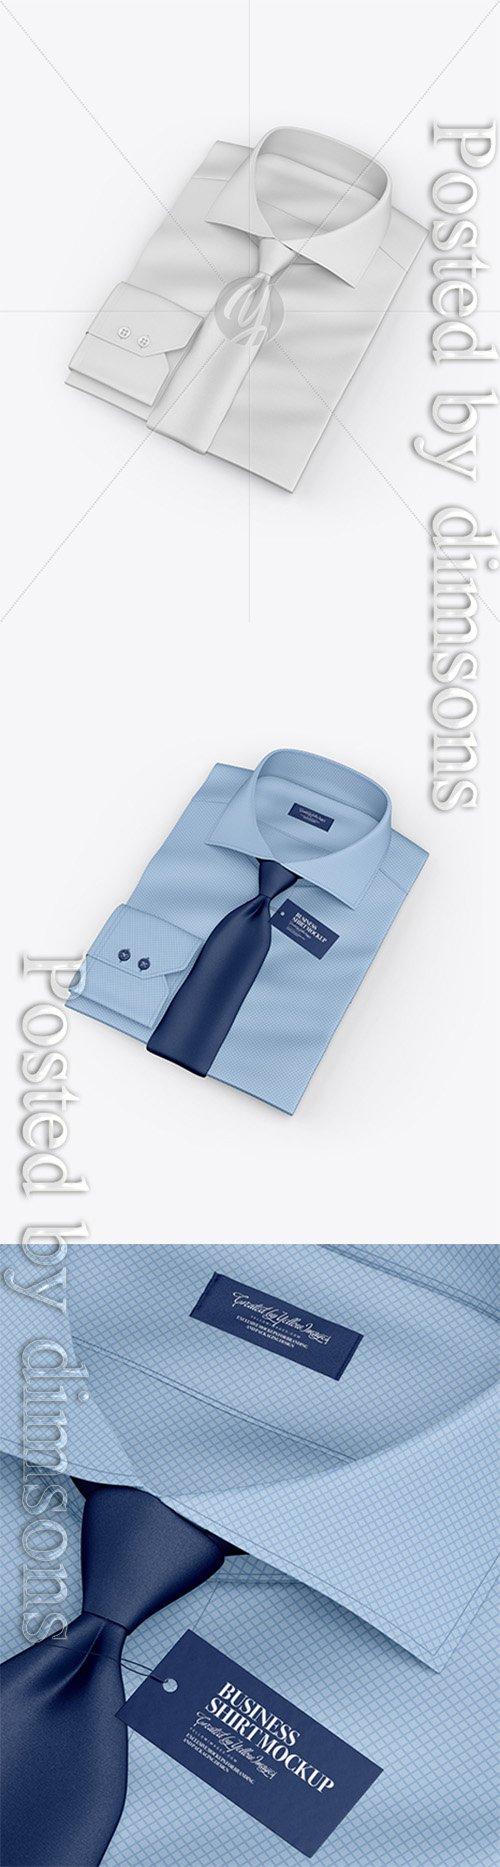 Folded Shirt With Tie Mockup - Half Side View (High-Angle Shot) 25072 TIF